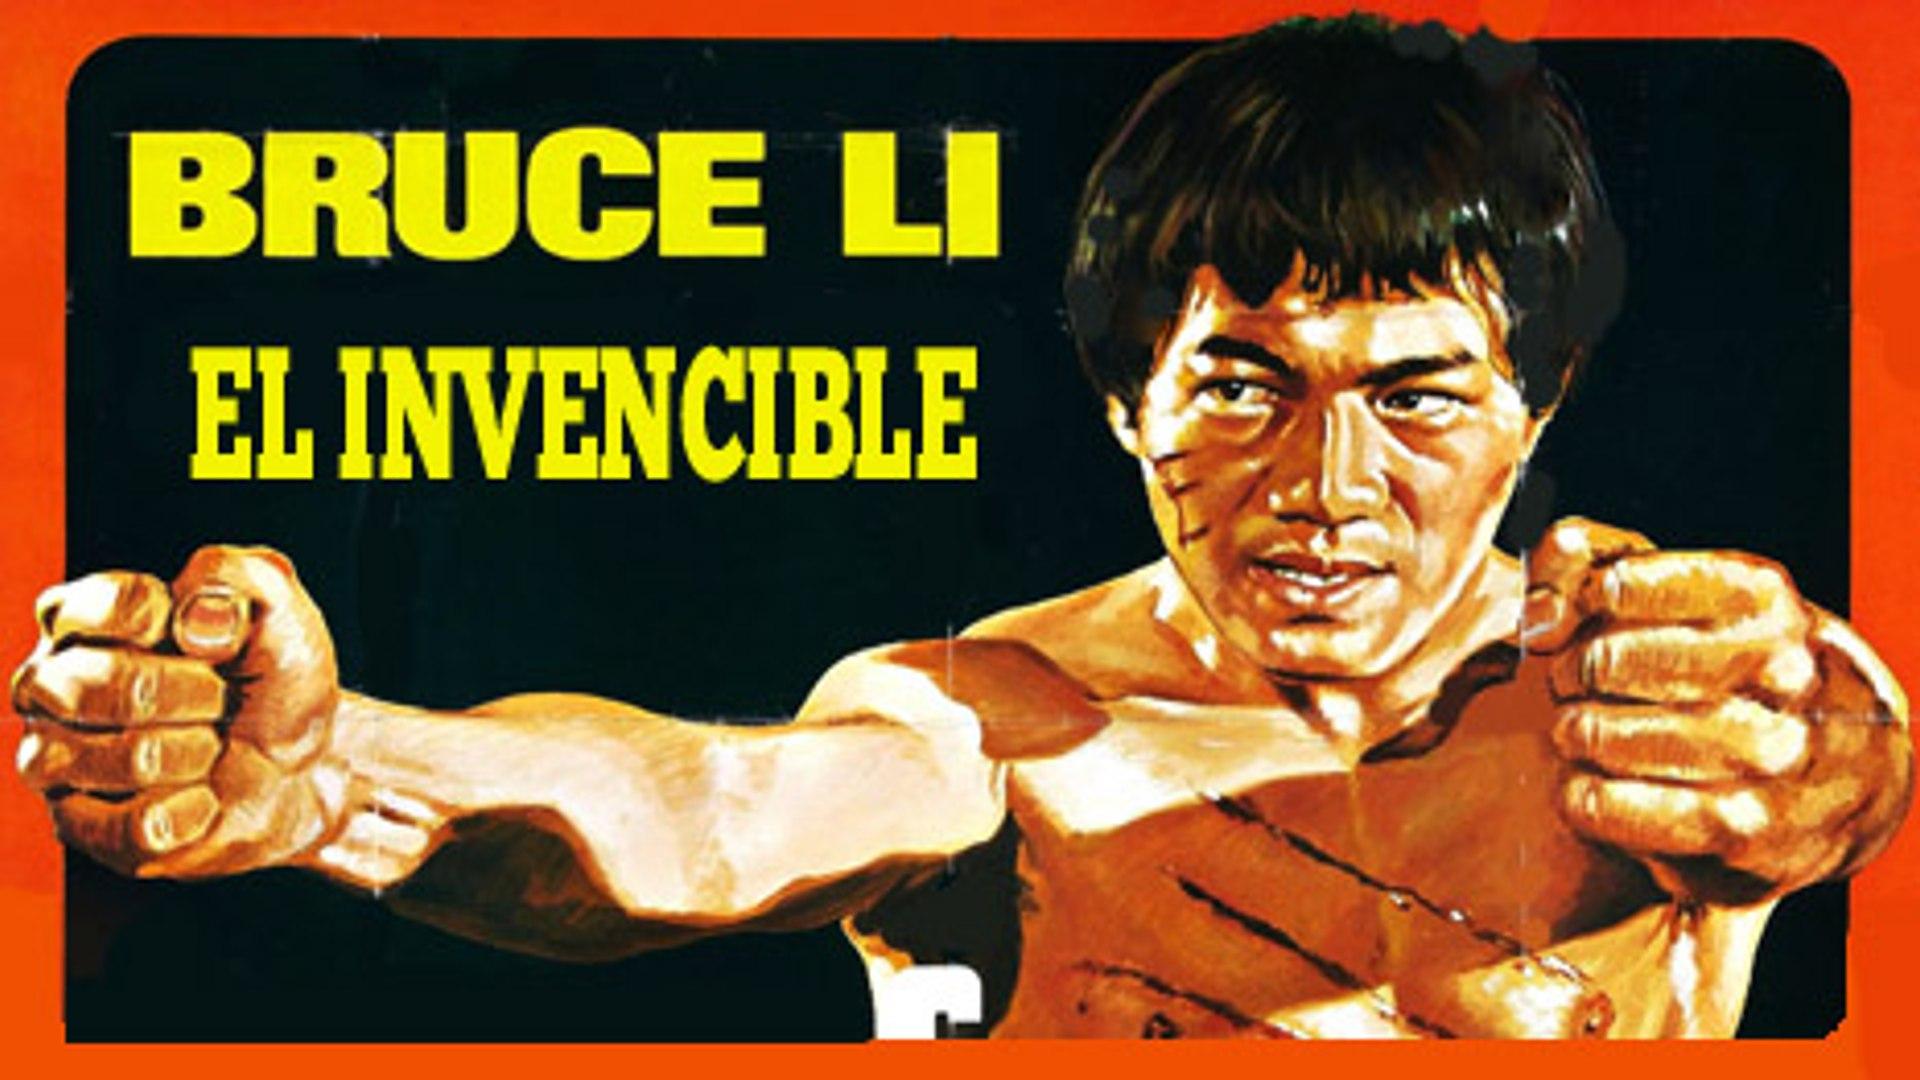 Bruce Li El Invencible 1 Parte Pelicula En Espanol